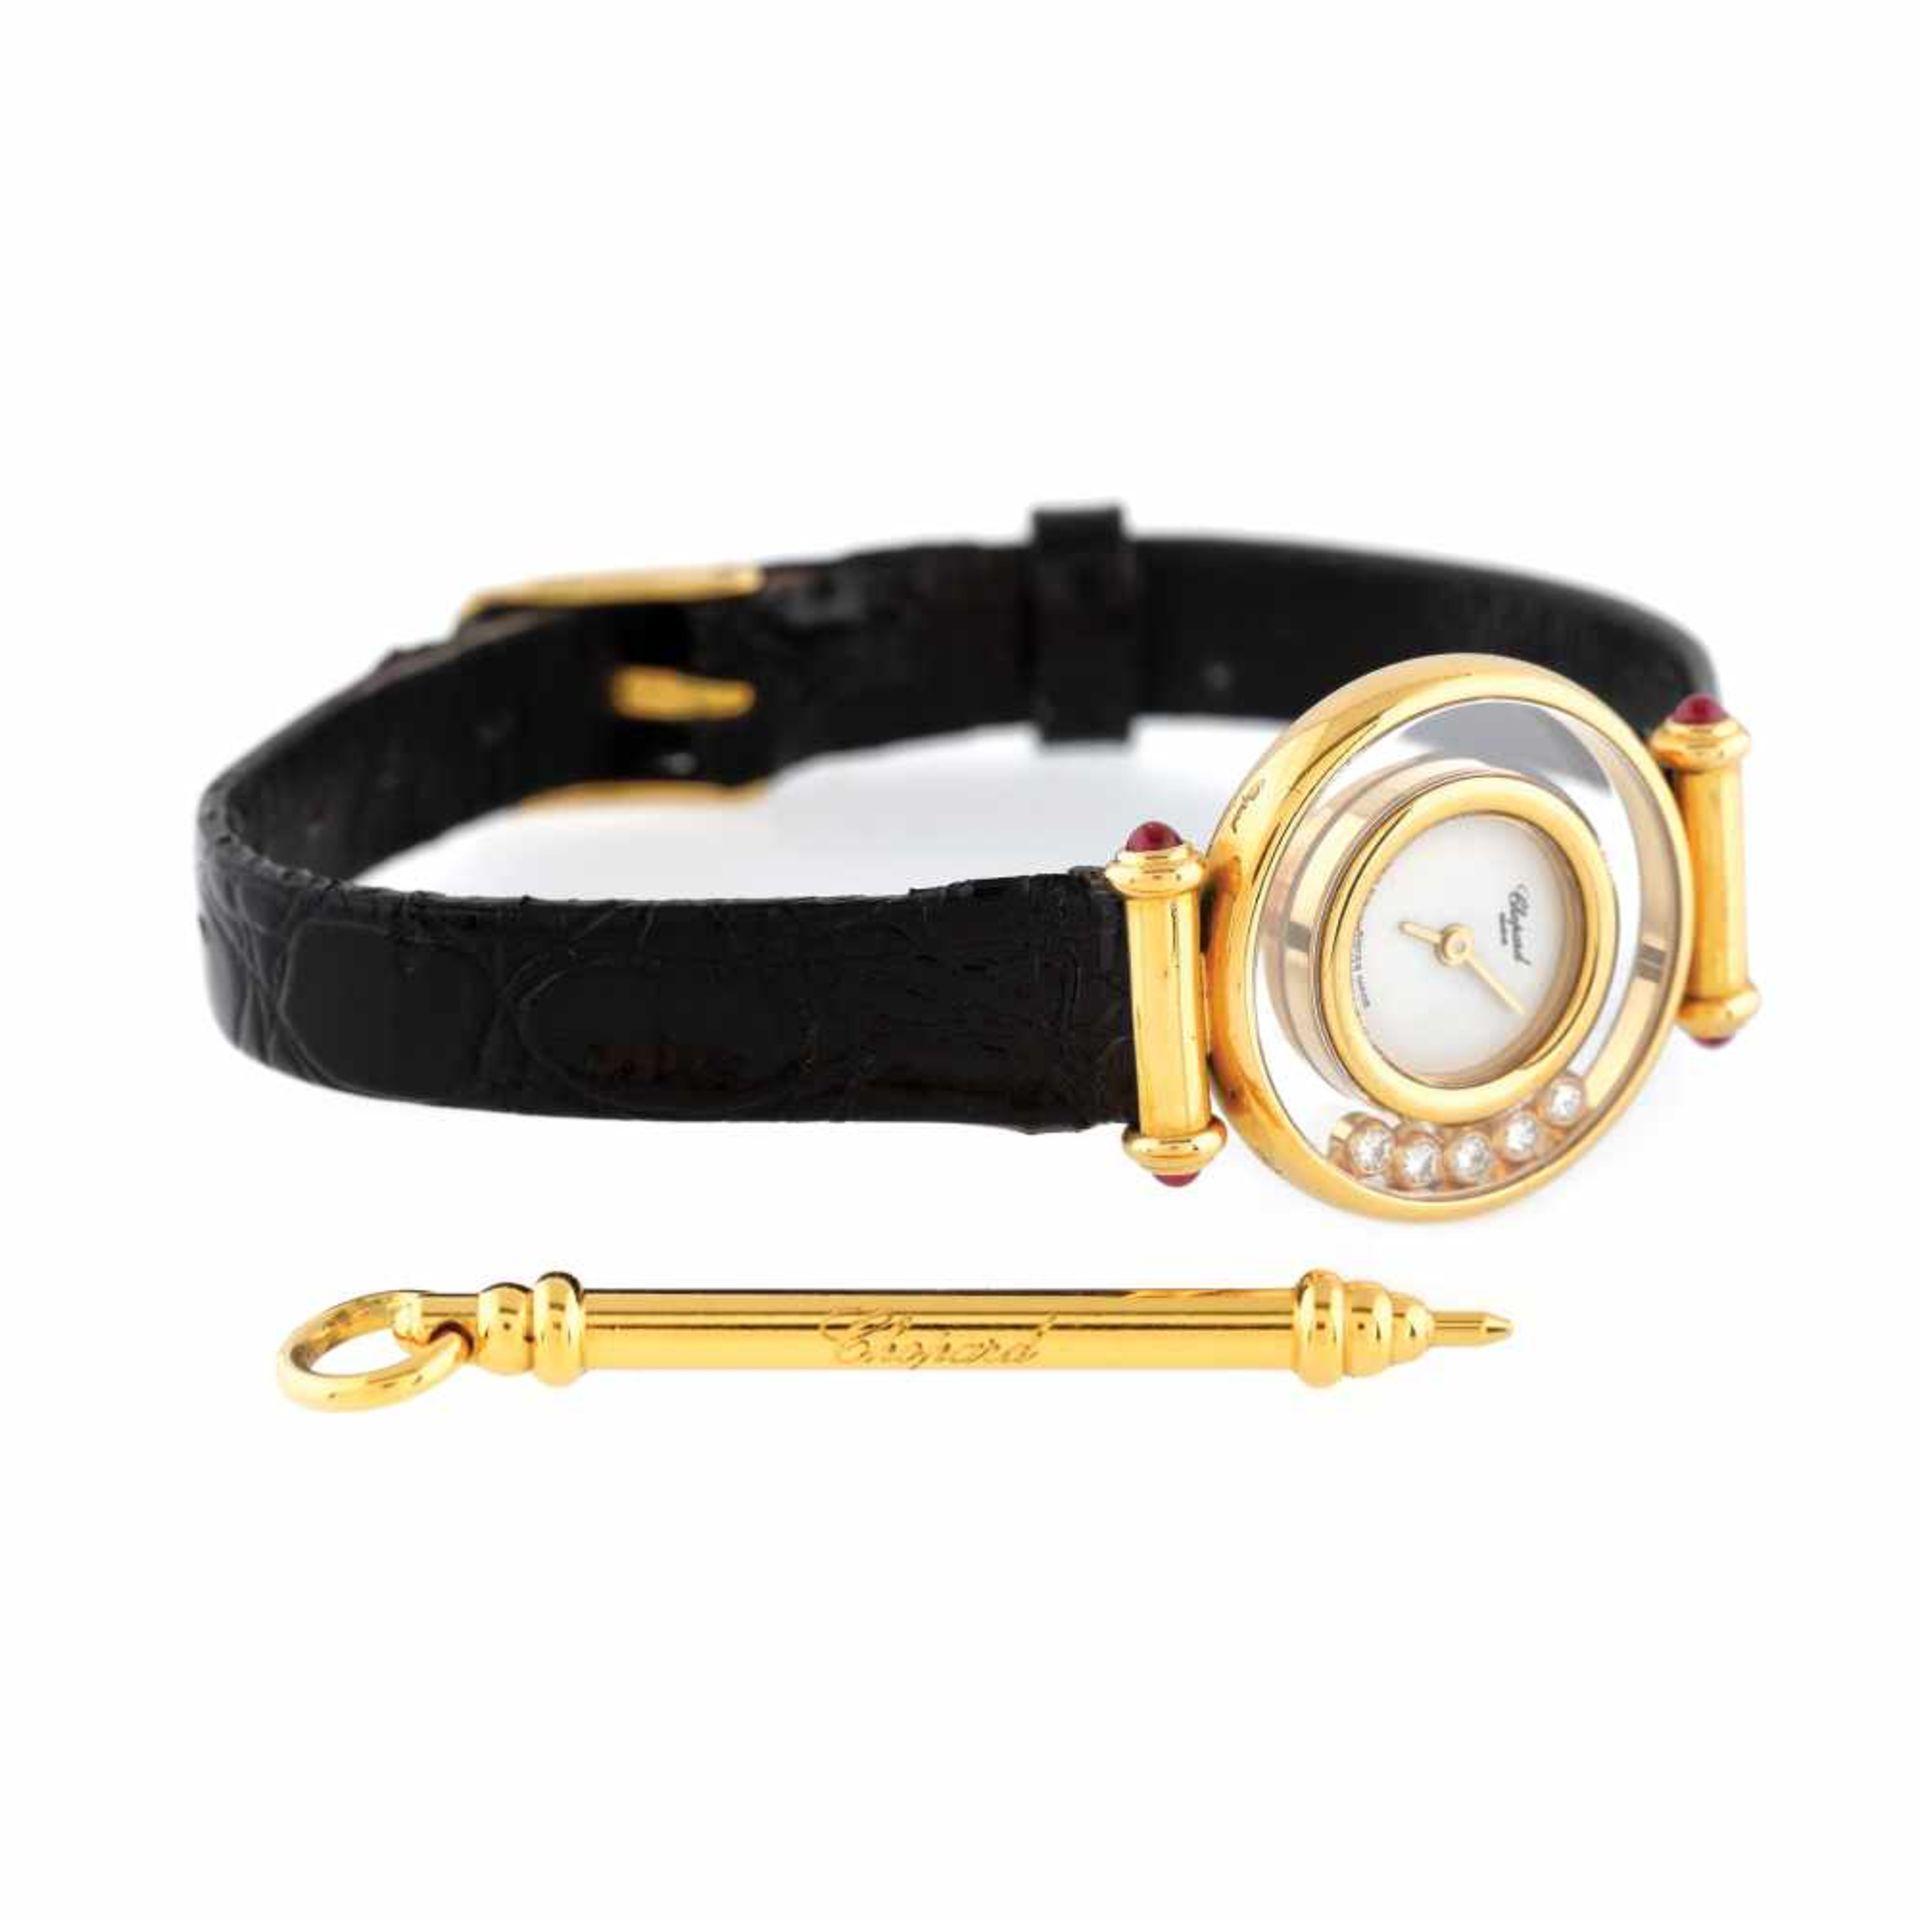 Chopard Happy Diamonds wristwatch, gold, women, decorated with diamonds and rubies, setting pin and - Bild 3 aus 3